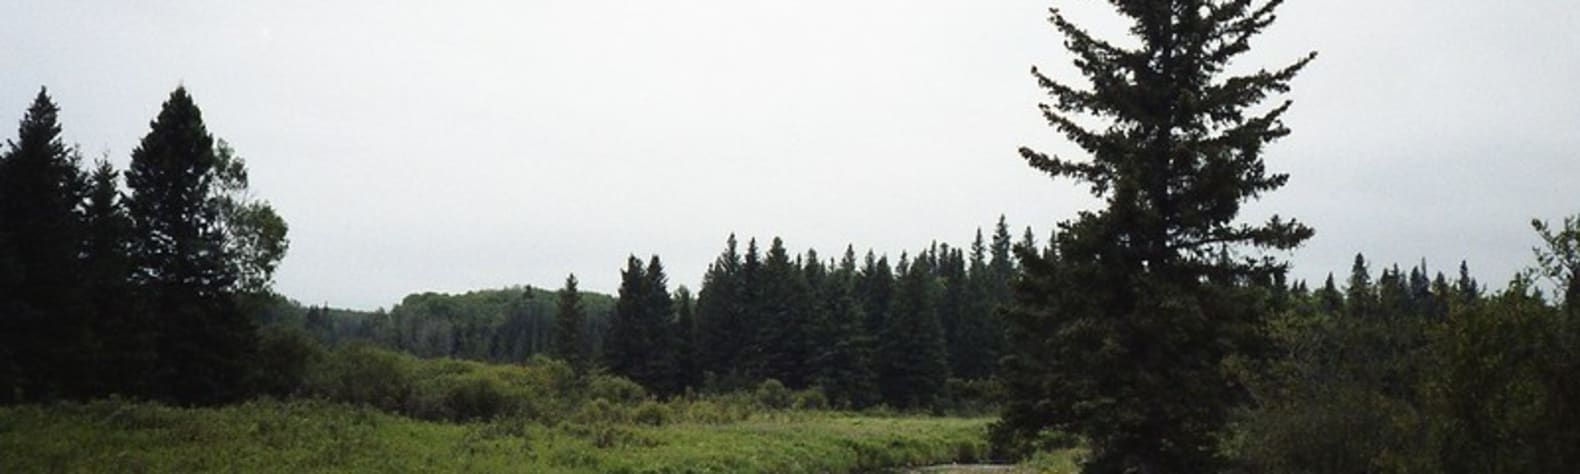 Riding Mountain National Park